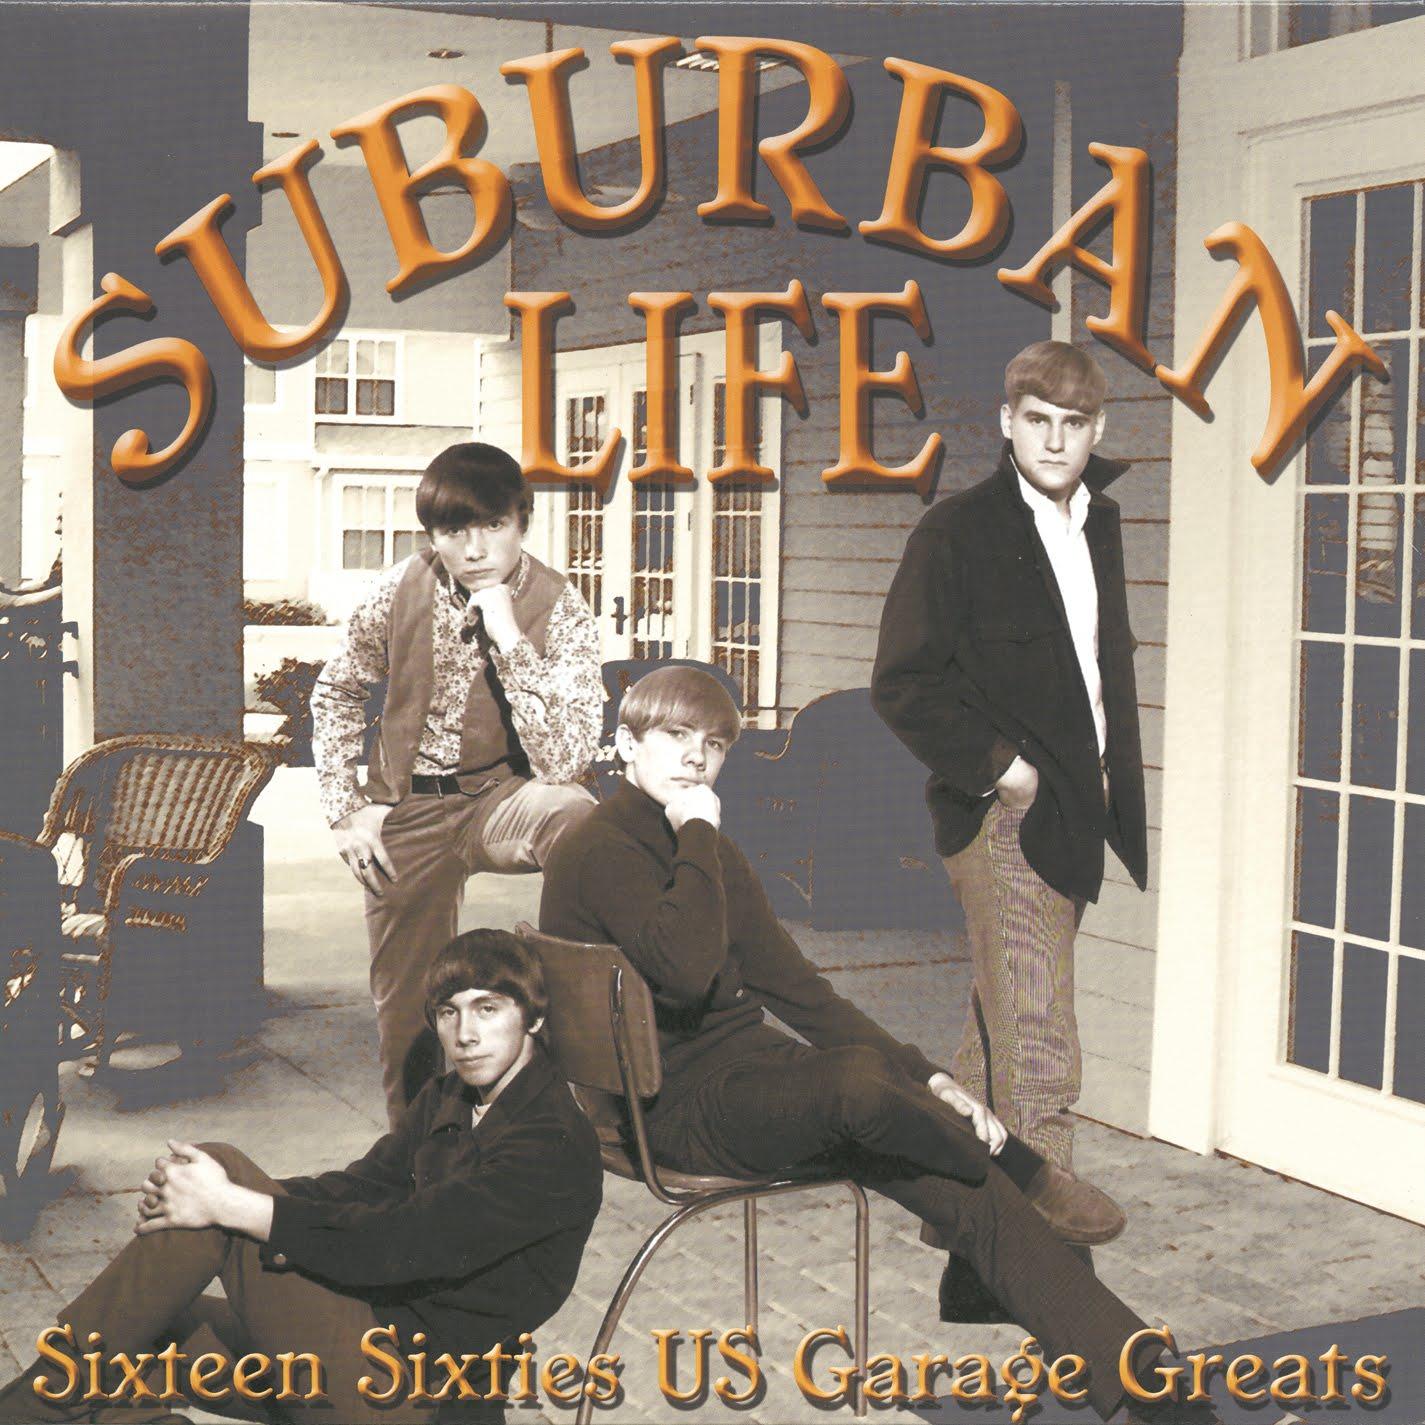 Power Pop Lovers Suburban Life Sixteen Sixties Us